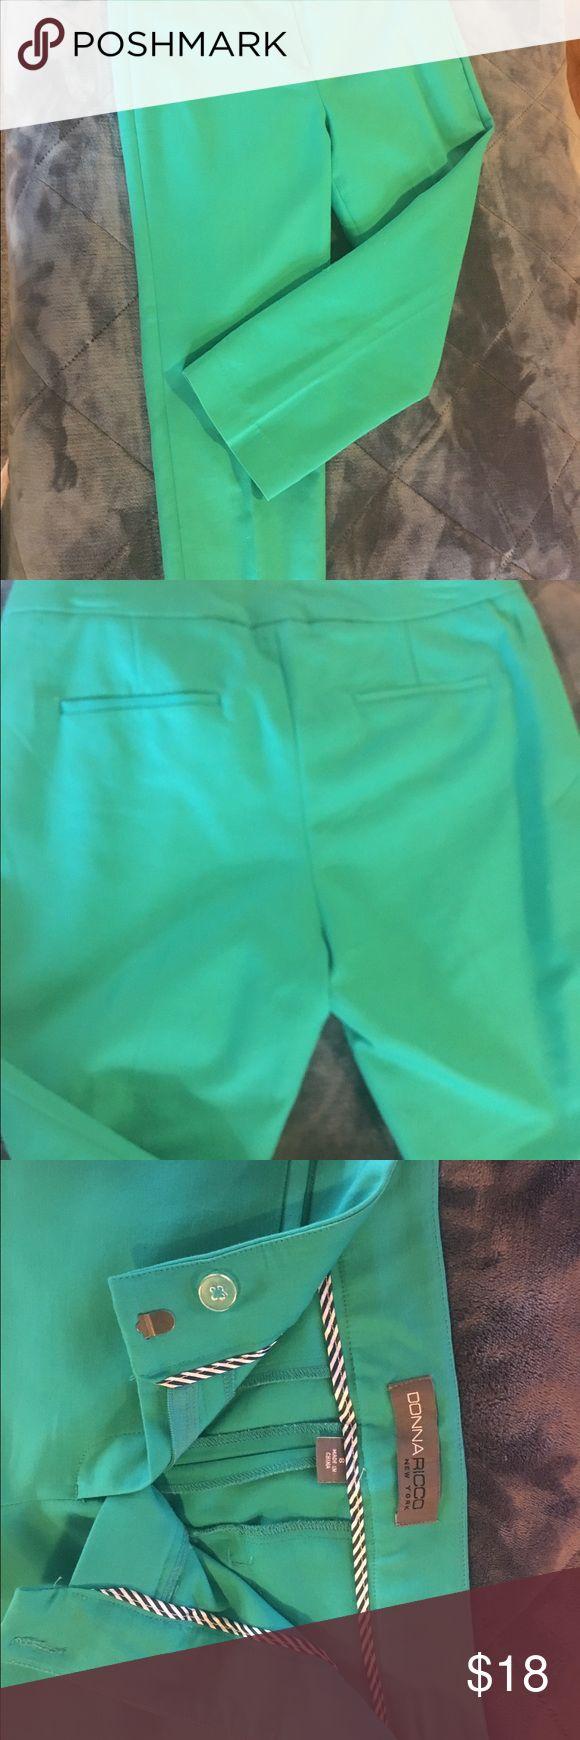 NWOT Donna Ricco capris NWOT turquoise Donna Ricco capris sz 8 in a cotton rayon blend. Cute for summer! Donna Ricco Pants Capris